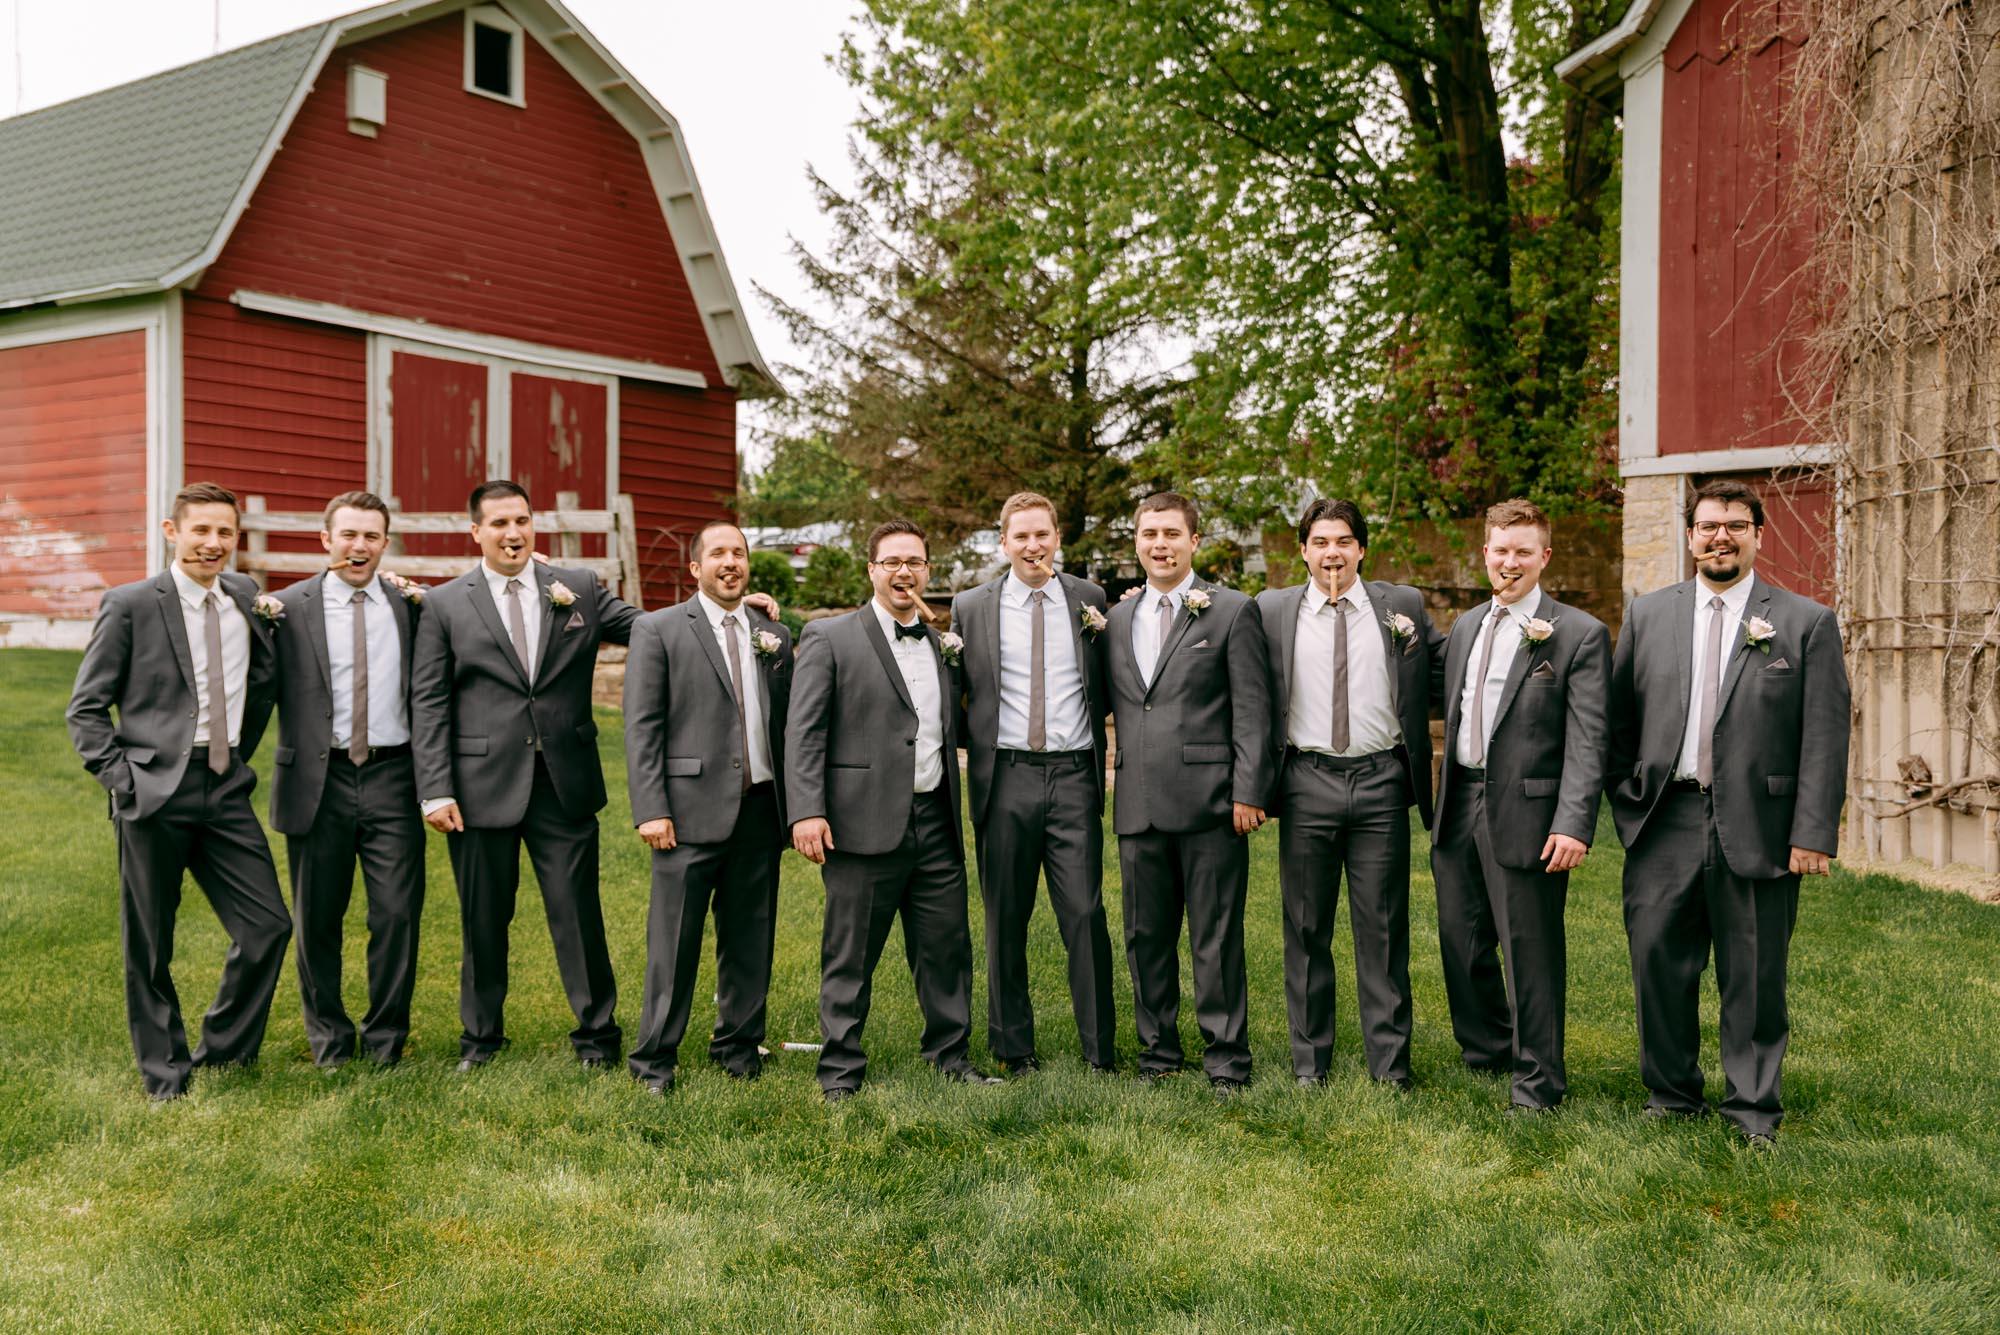 orchard-farms-pavillion-wedding-rockton-IL-wedding-photographers-138.jpg